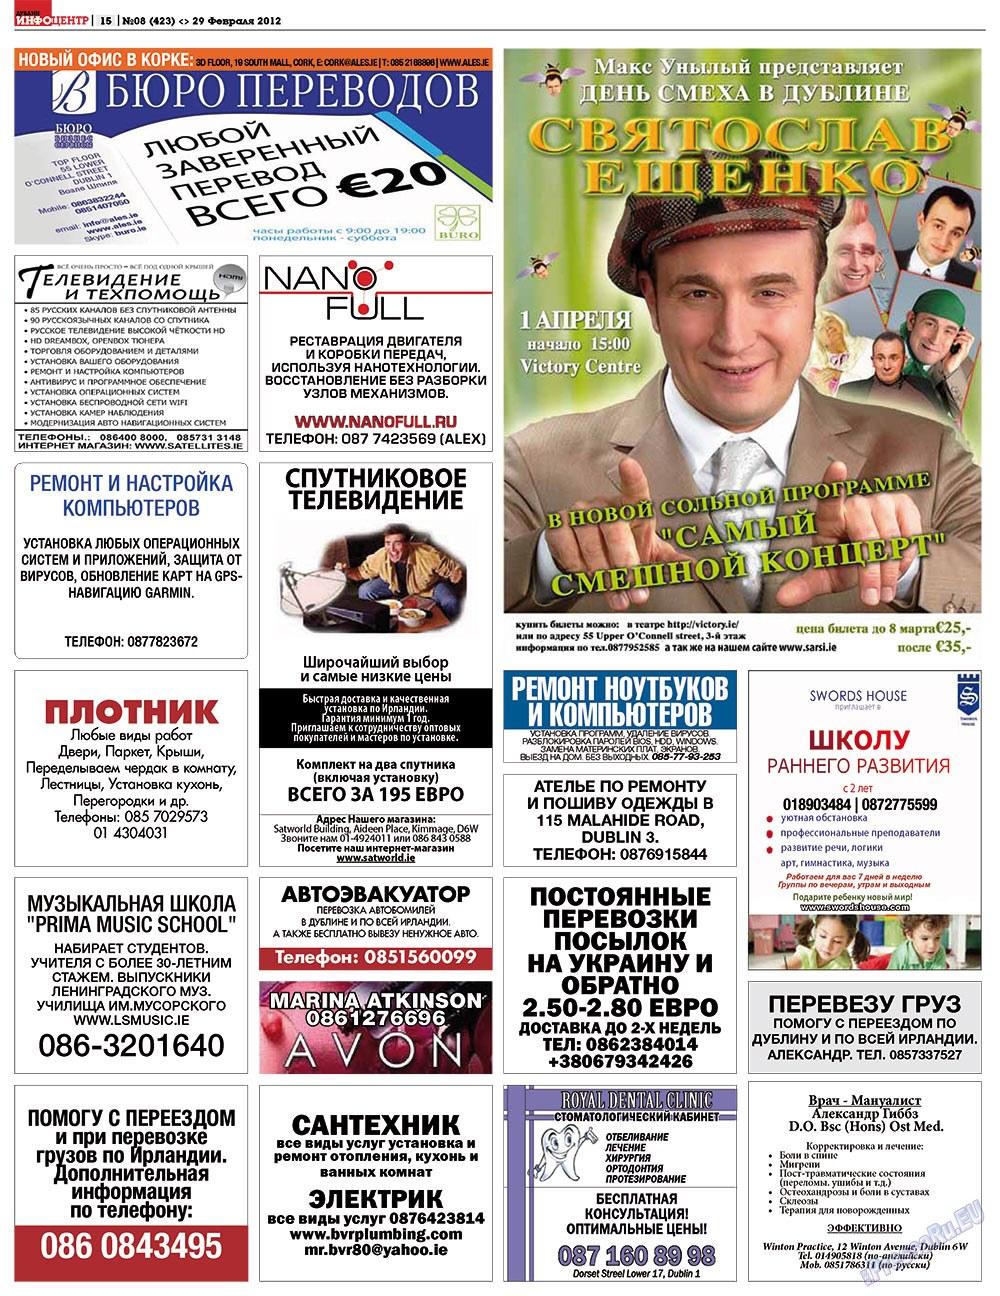 Дублин инфоцентр (газета). 2012 год, номер 8, стр. 15